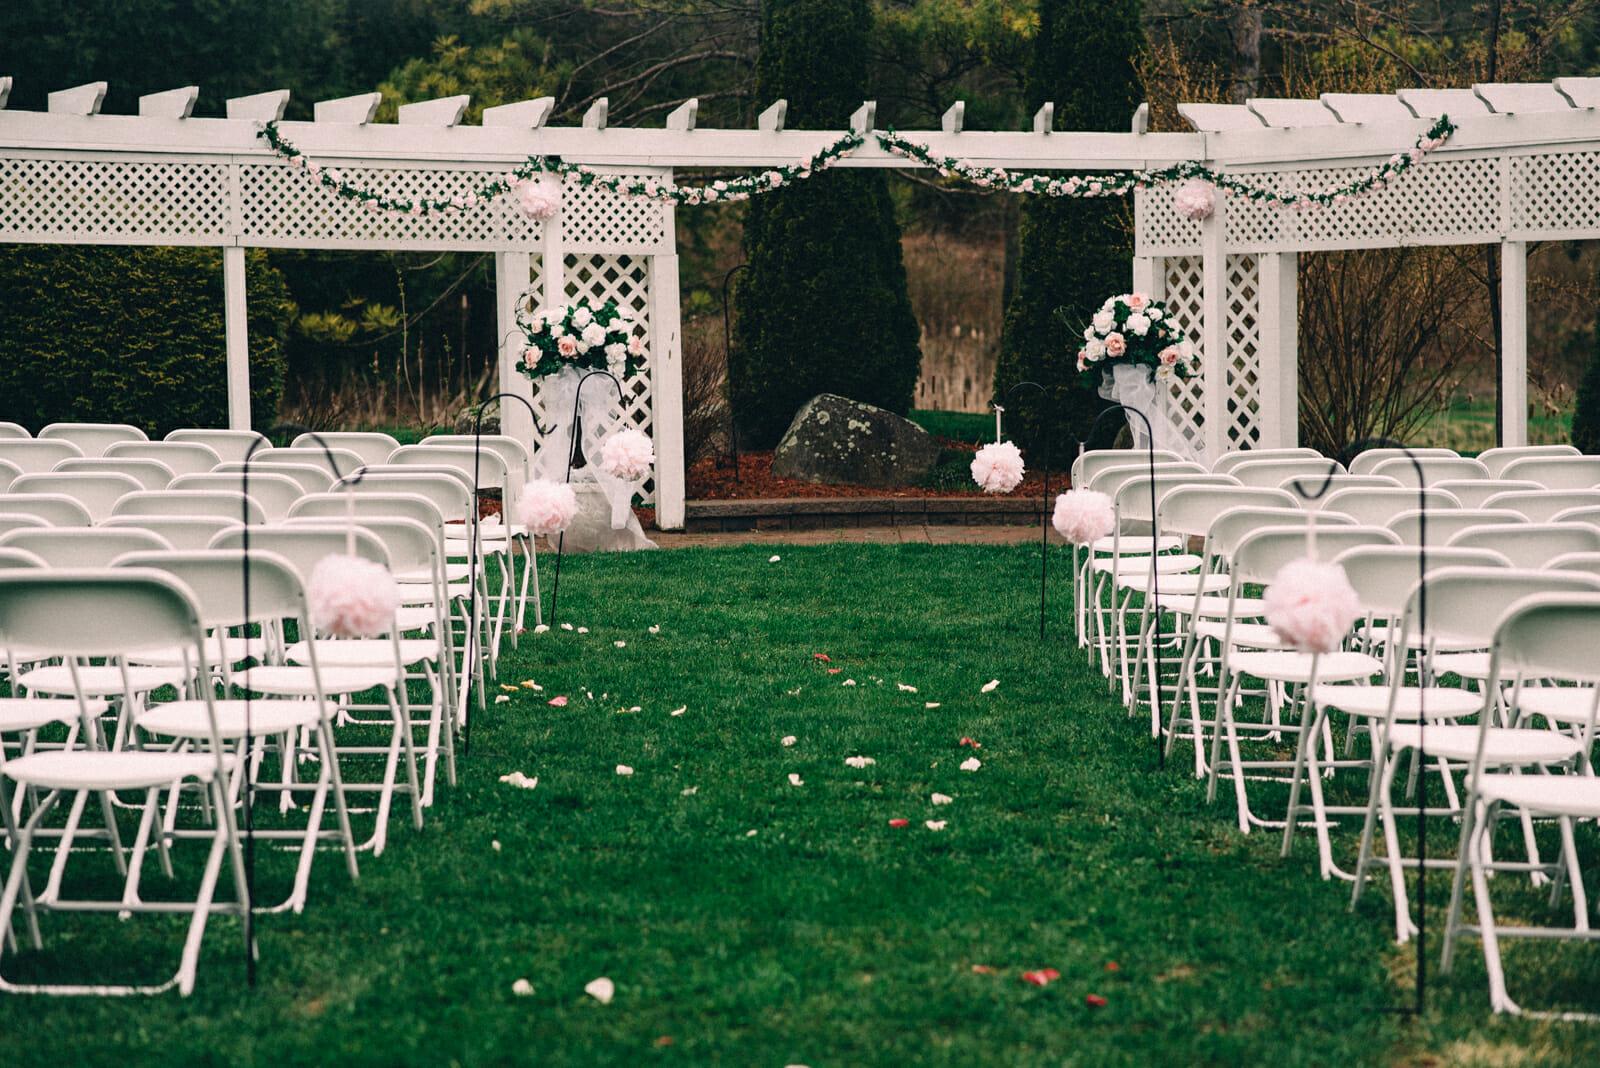 trillium trails wedding ceremony oshawa